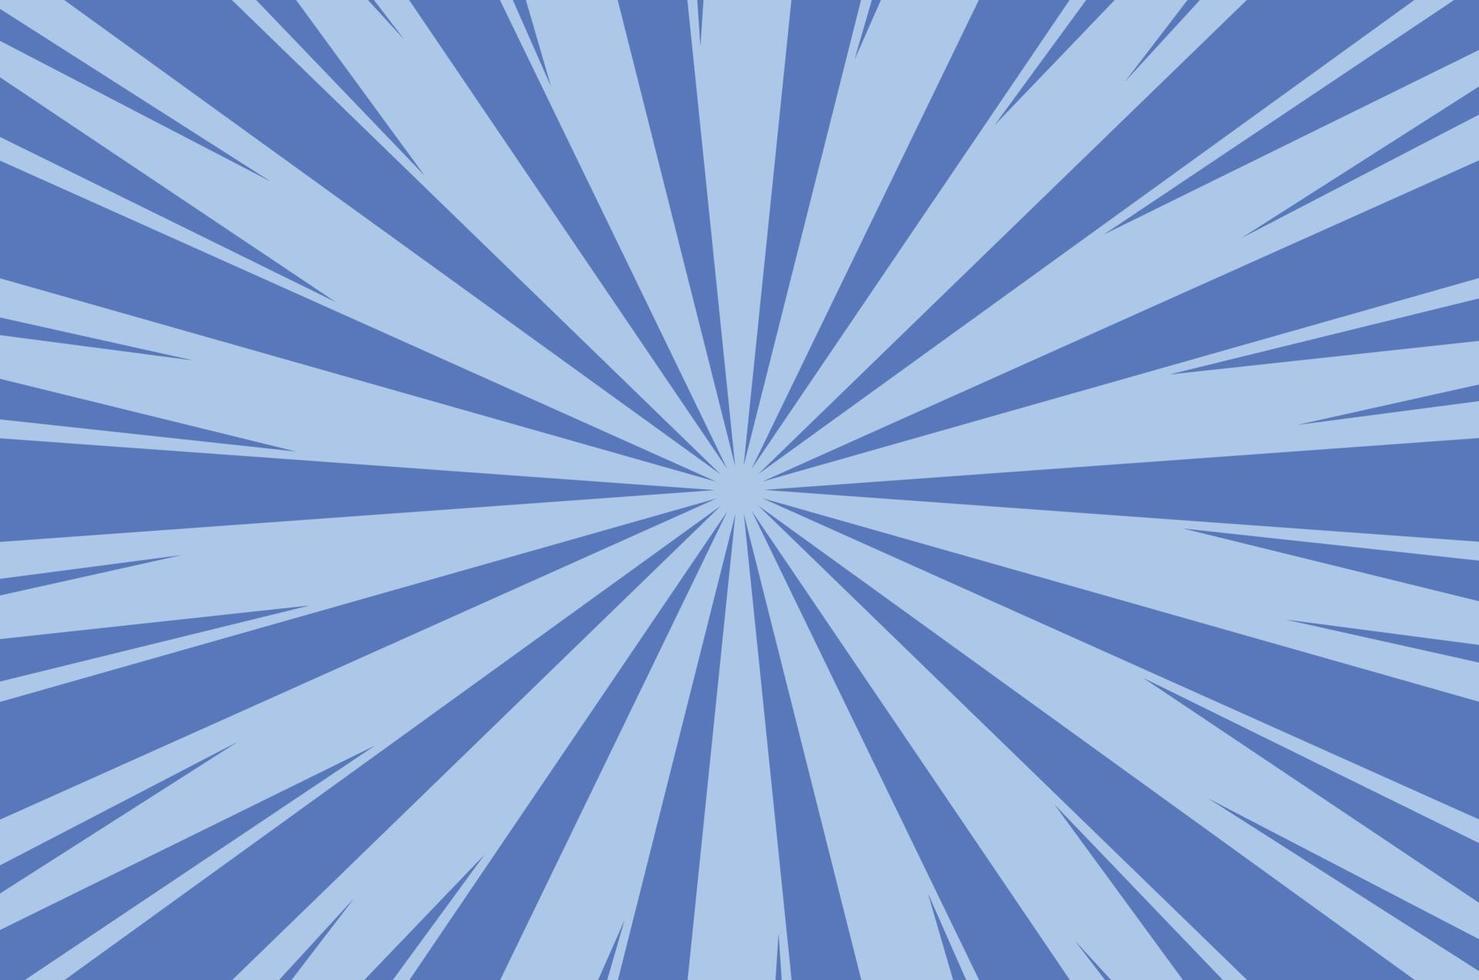 Fondo de luz solar de dibujos animados cómico abstracto azul vector